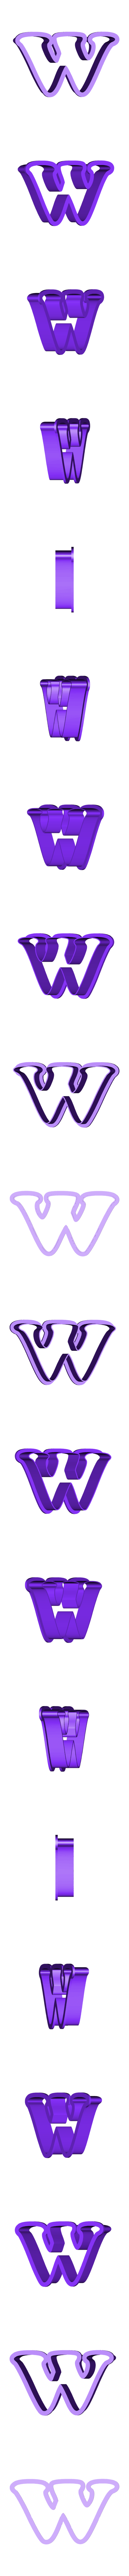 w.stl Download free STL file A-Z alphabet cookie cutter • 3D printer design, BlackSand3DMaker